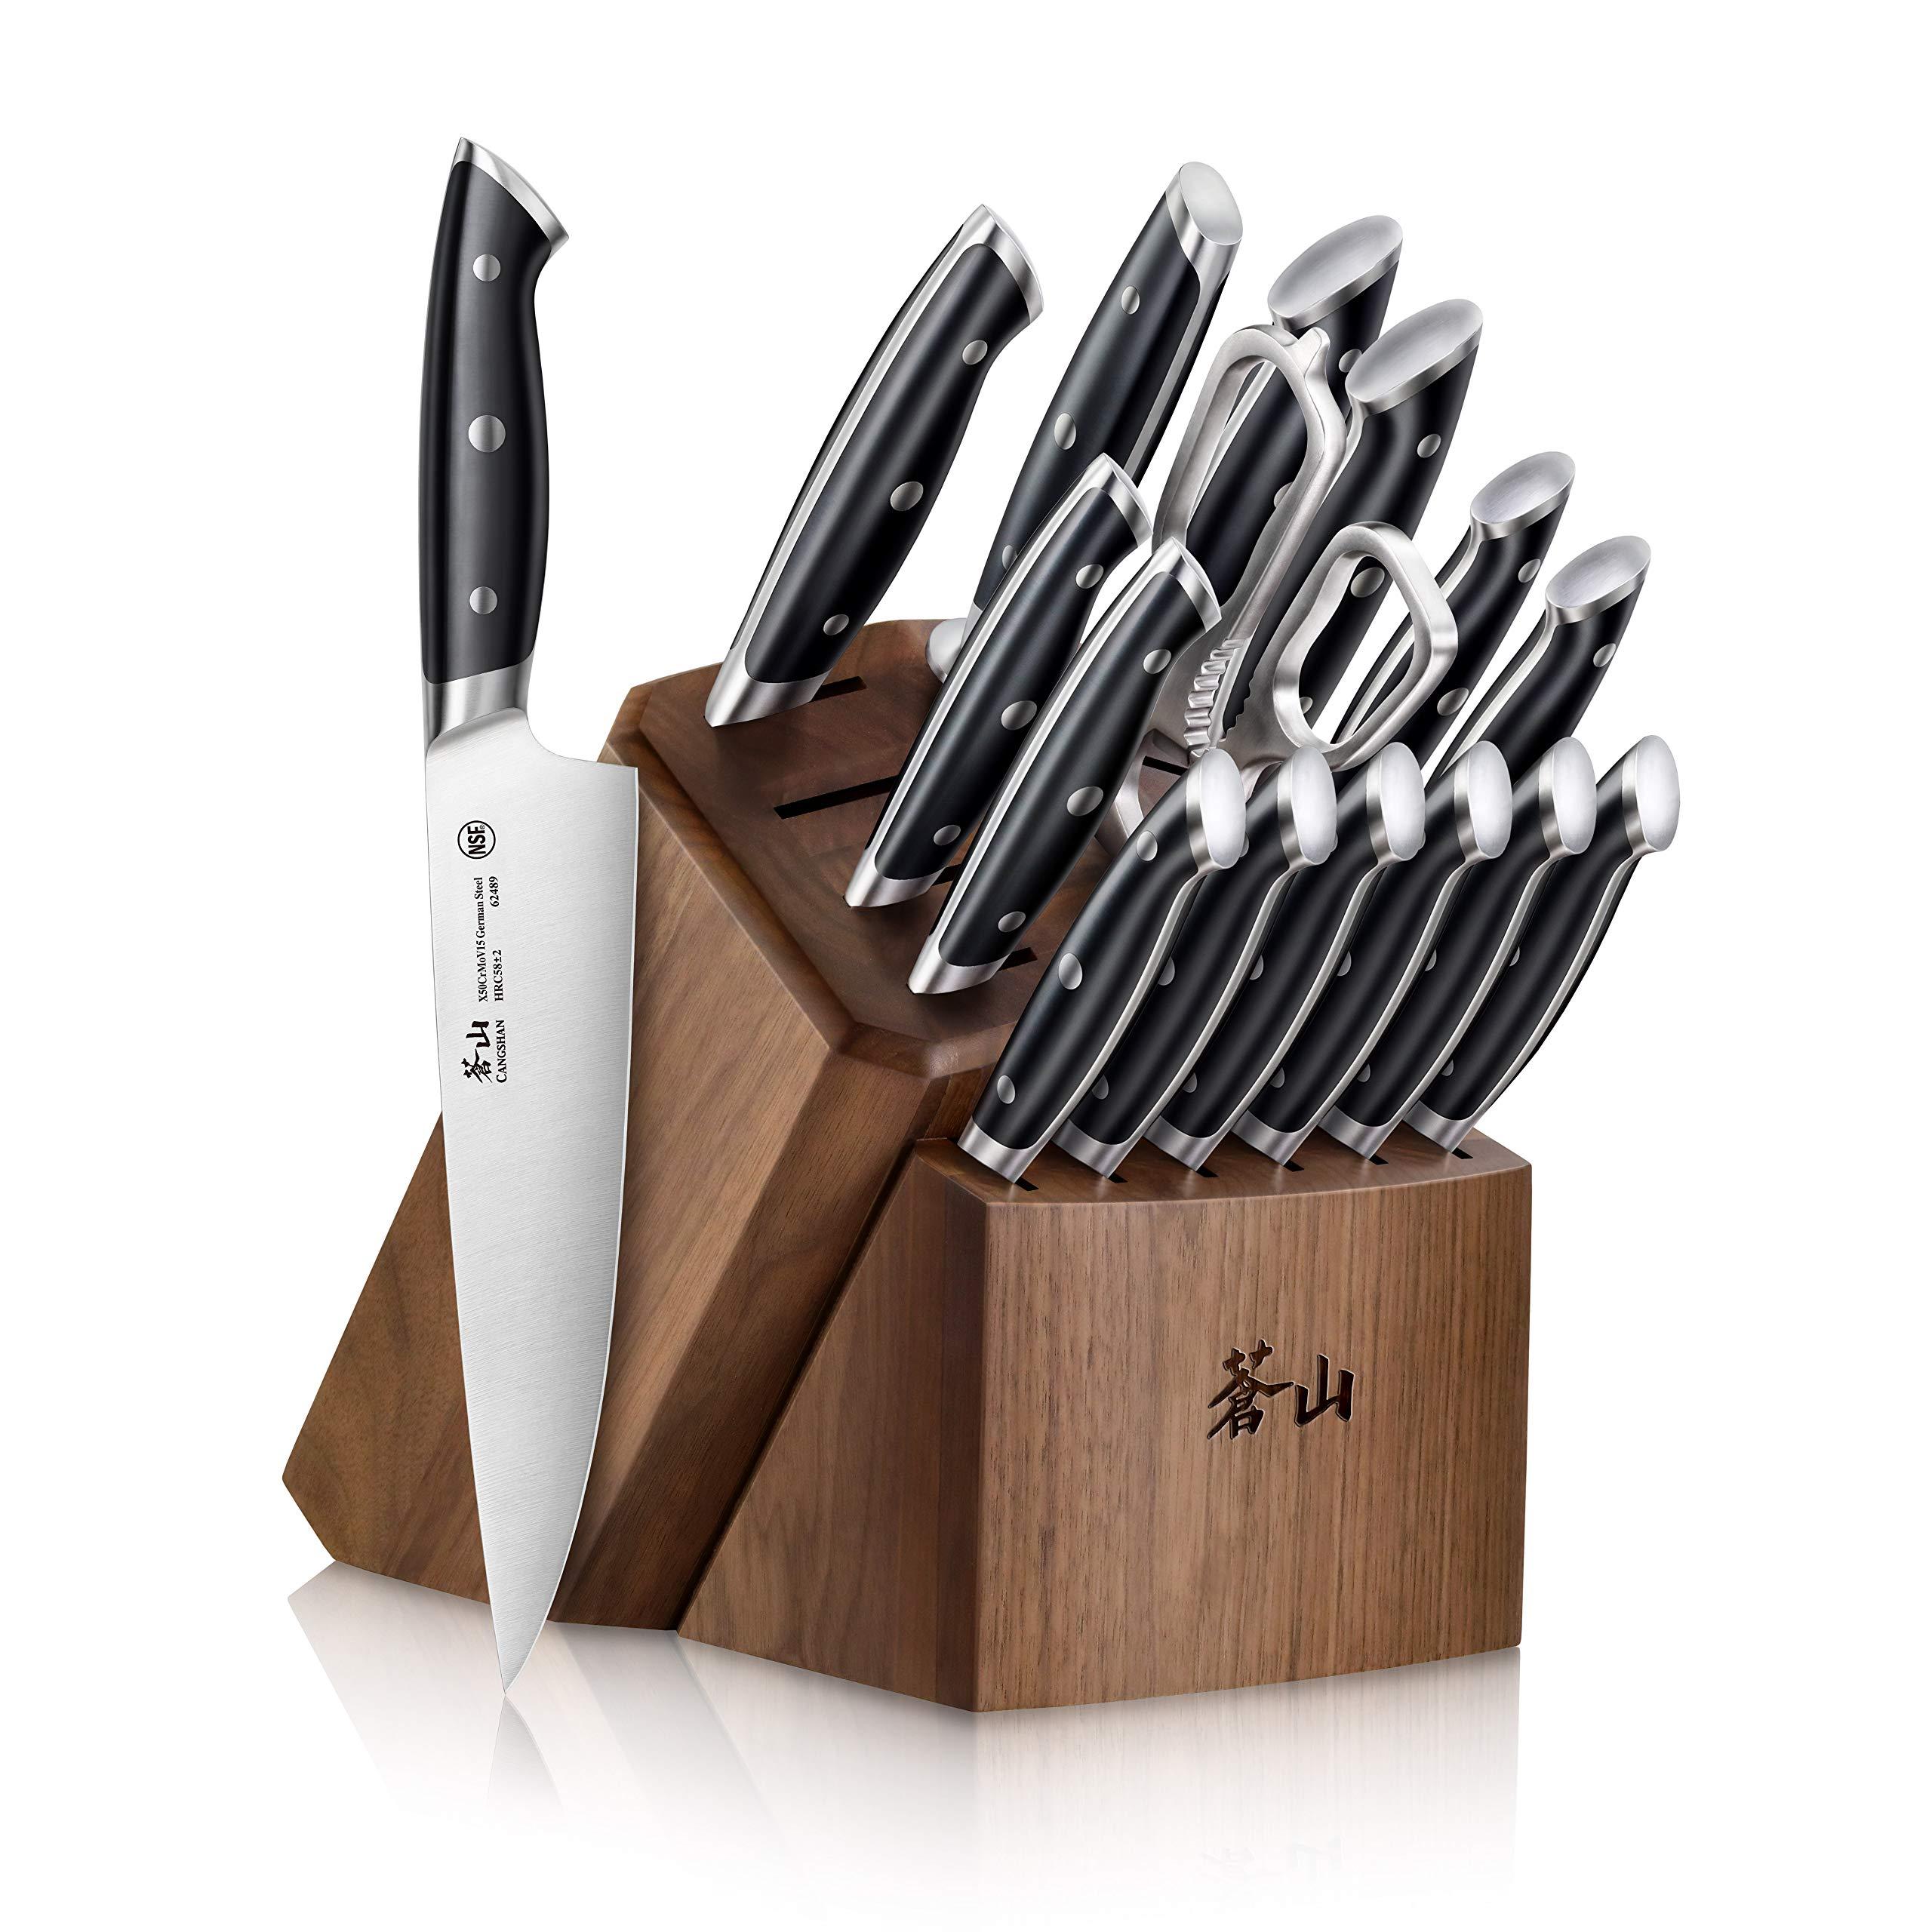 Cangshan Z Series 1024180 German Steel Forged 17-Piece Knife Block Set, Walnut by Cangshan